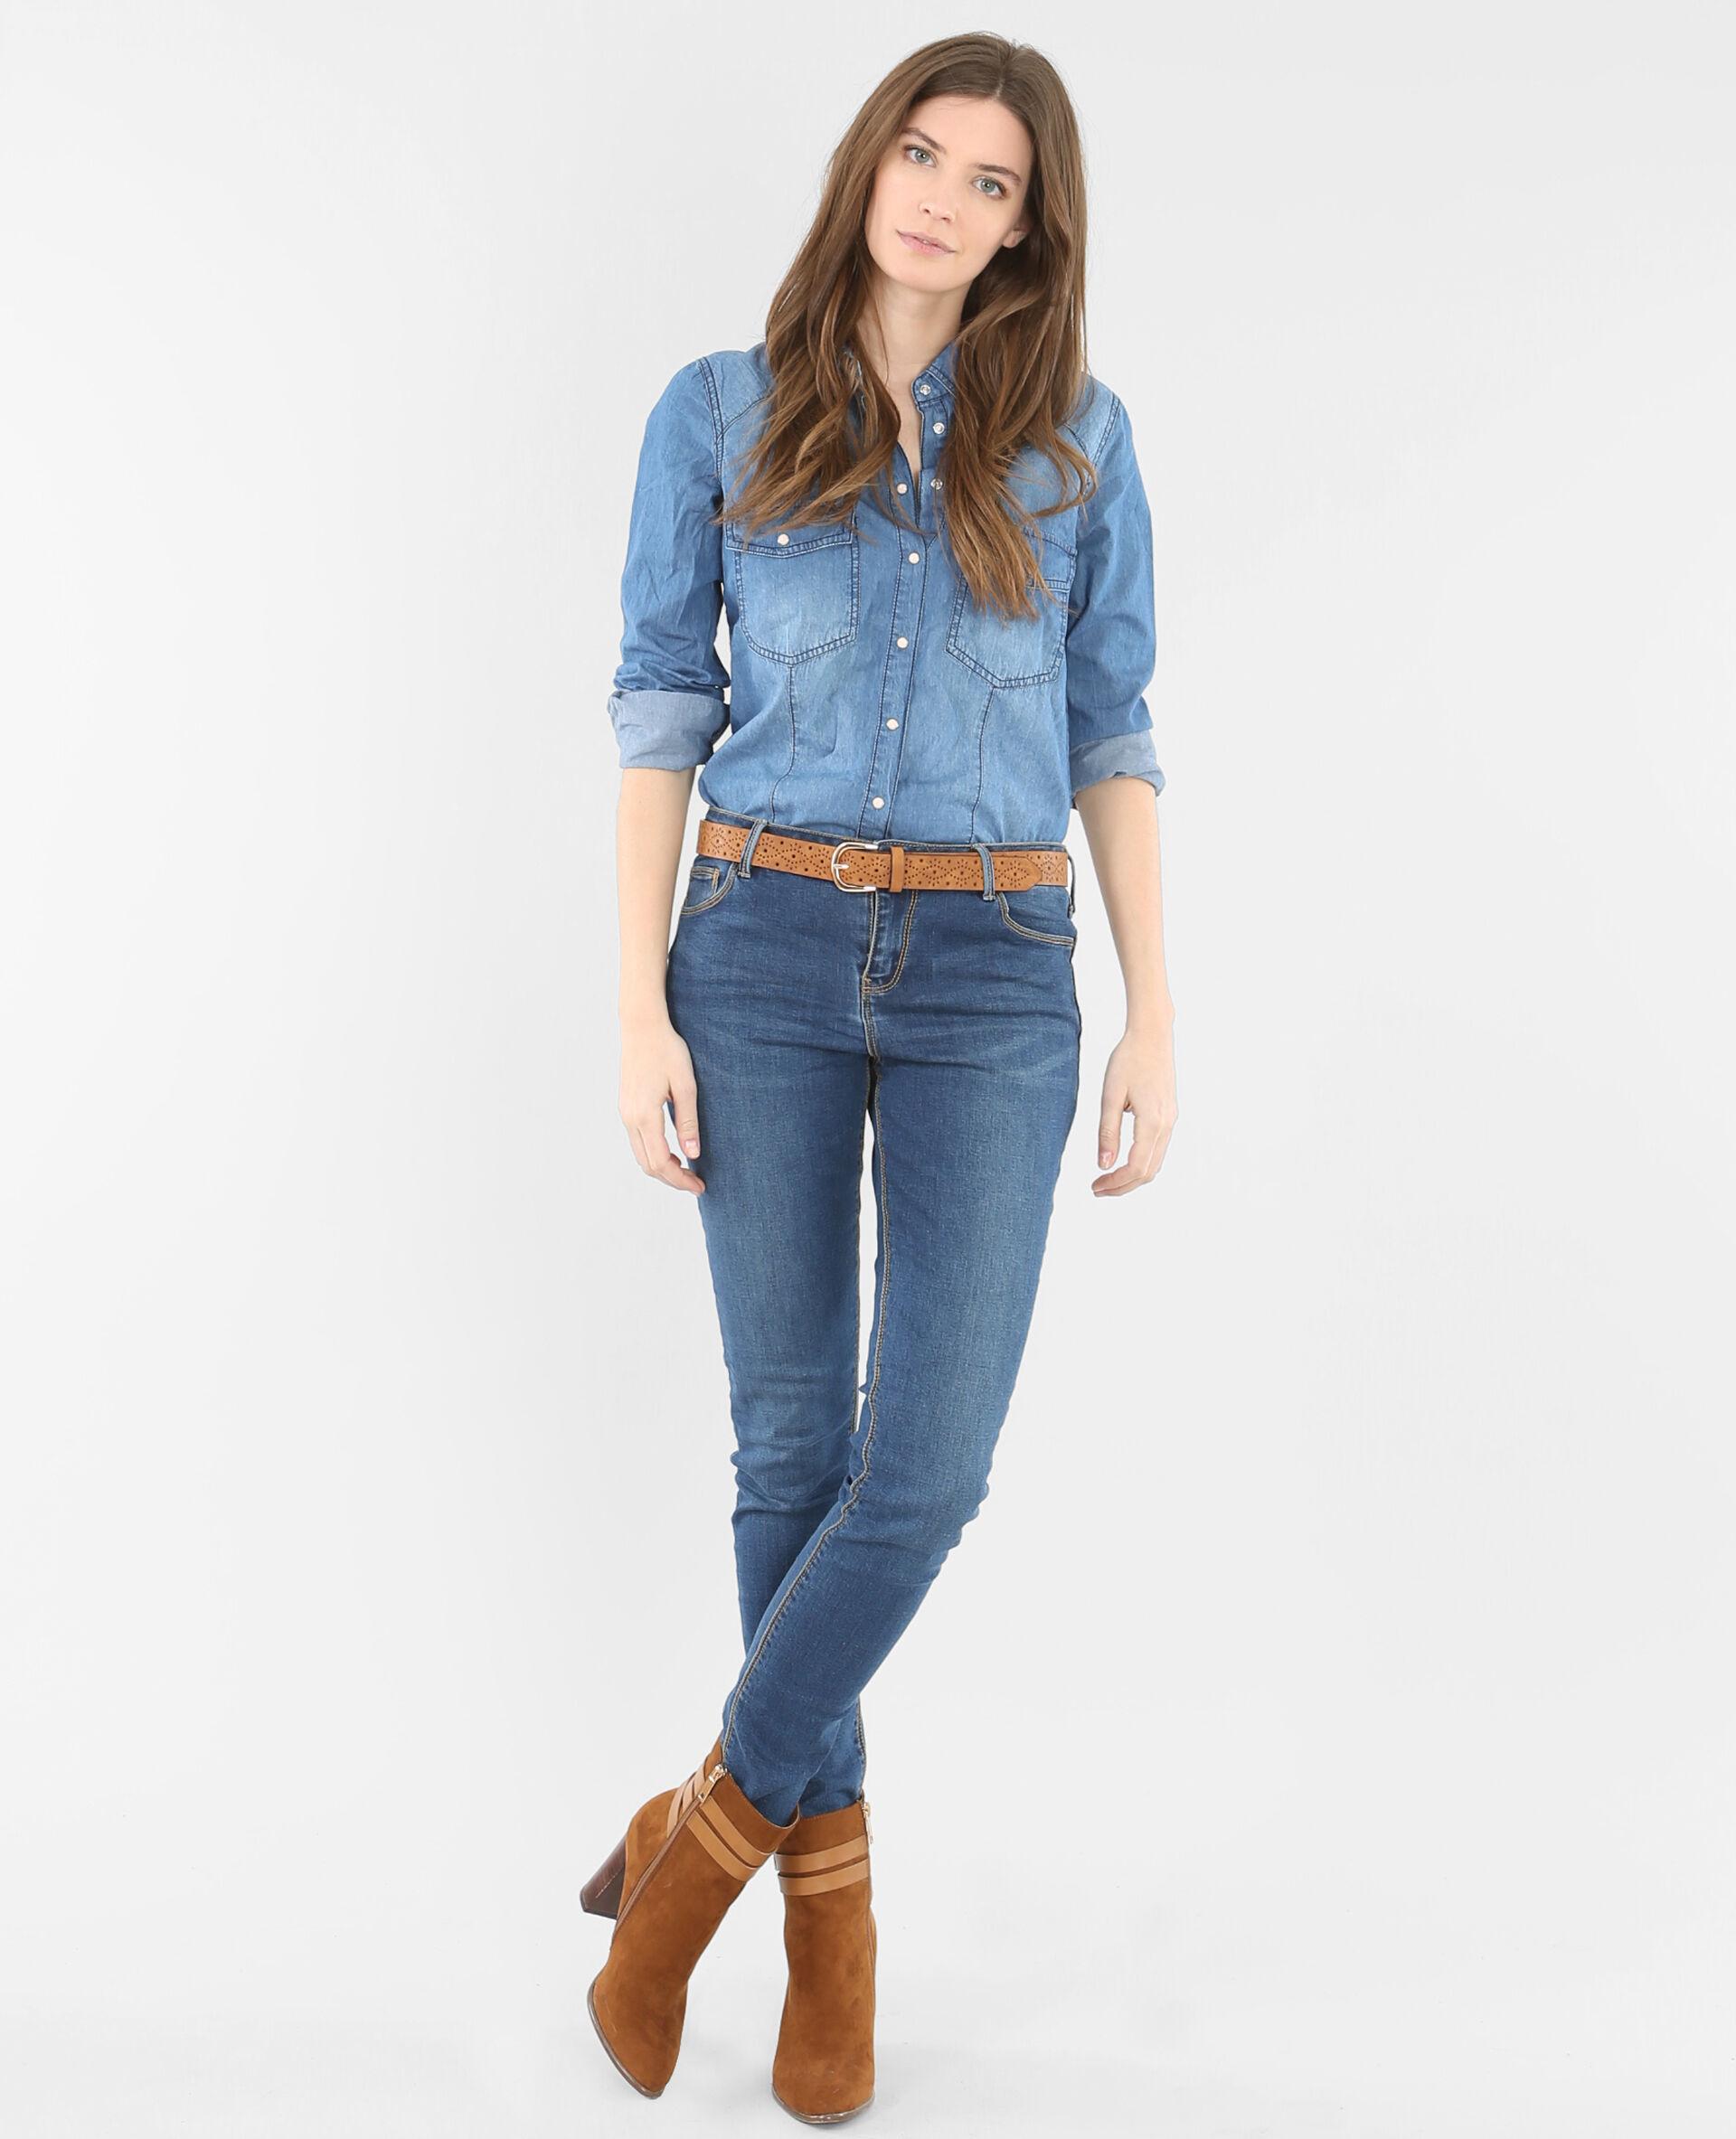 Robe en jean femme pimkie